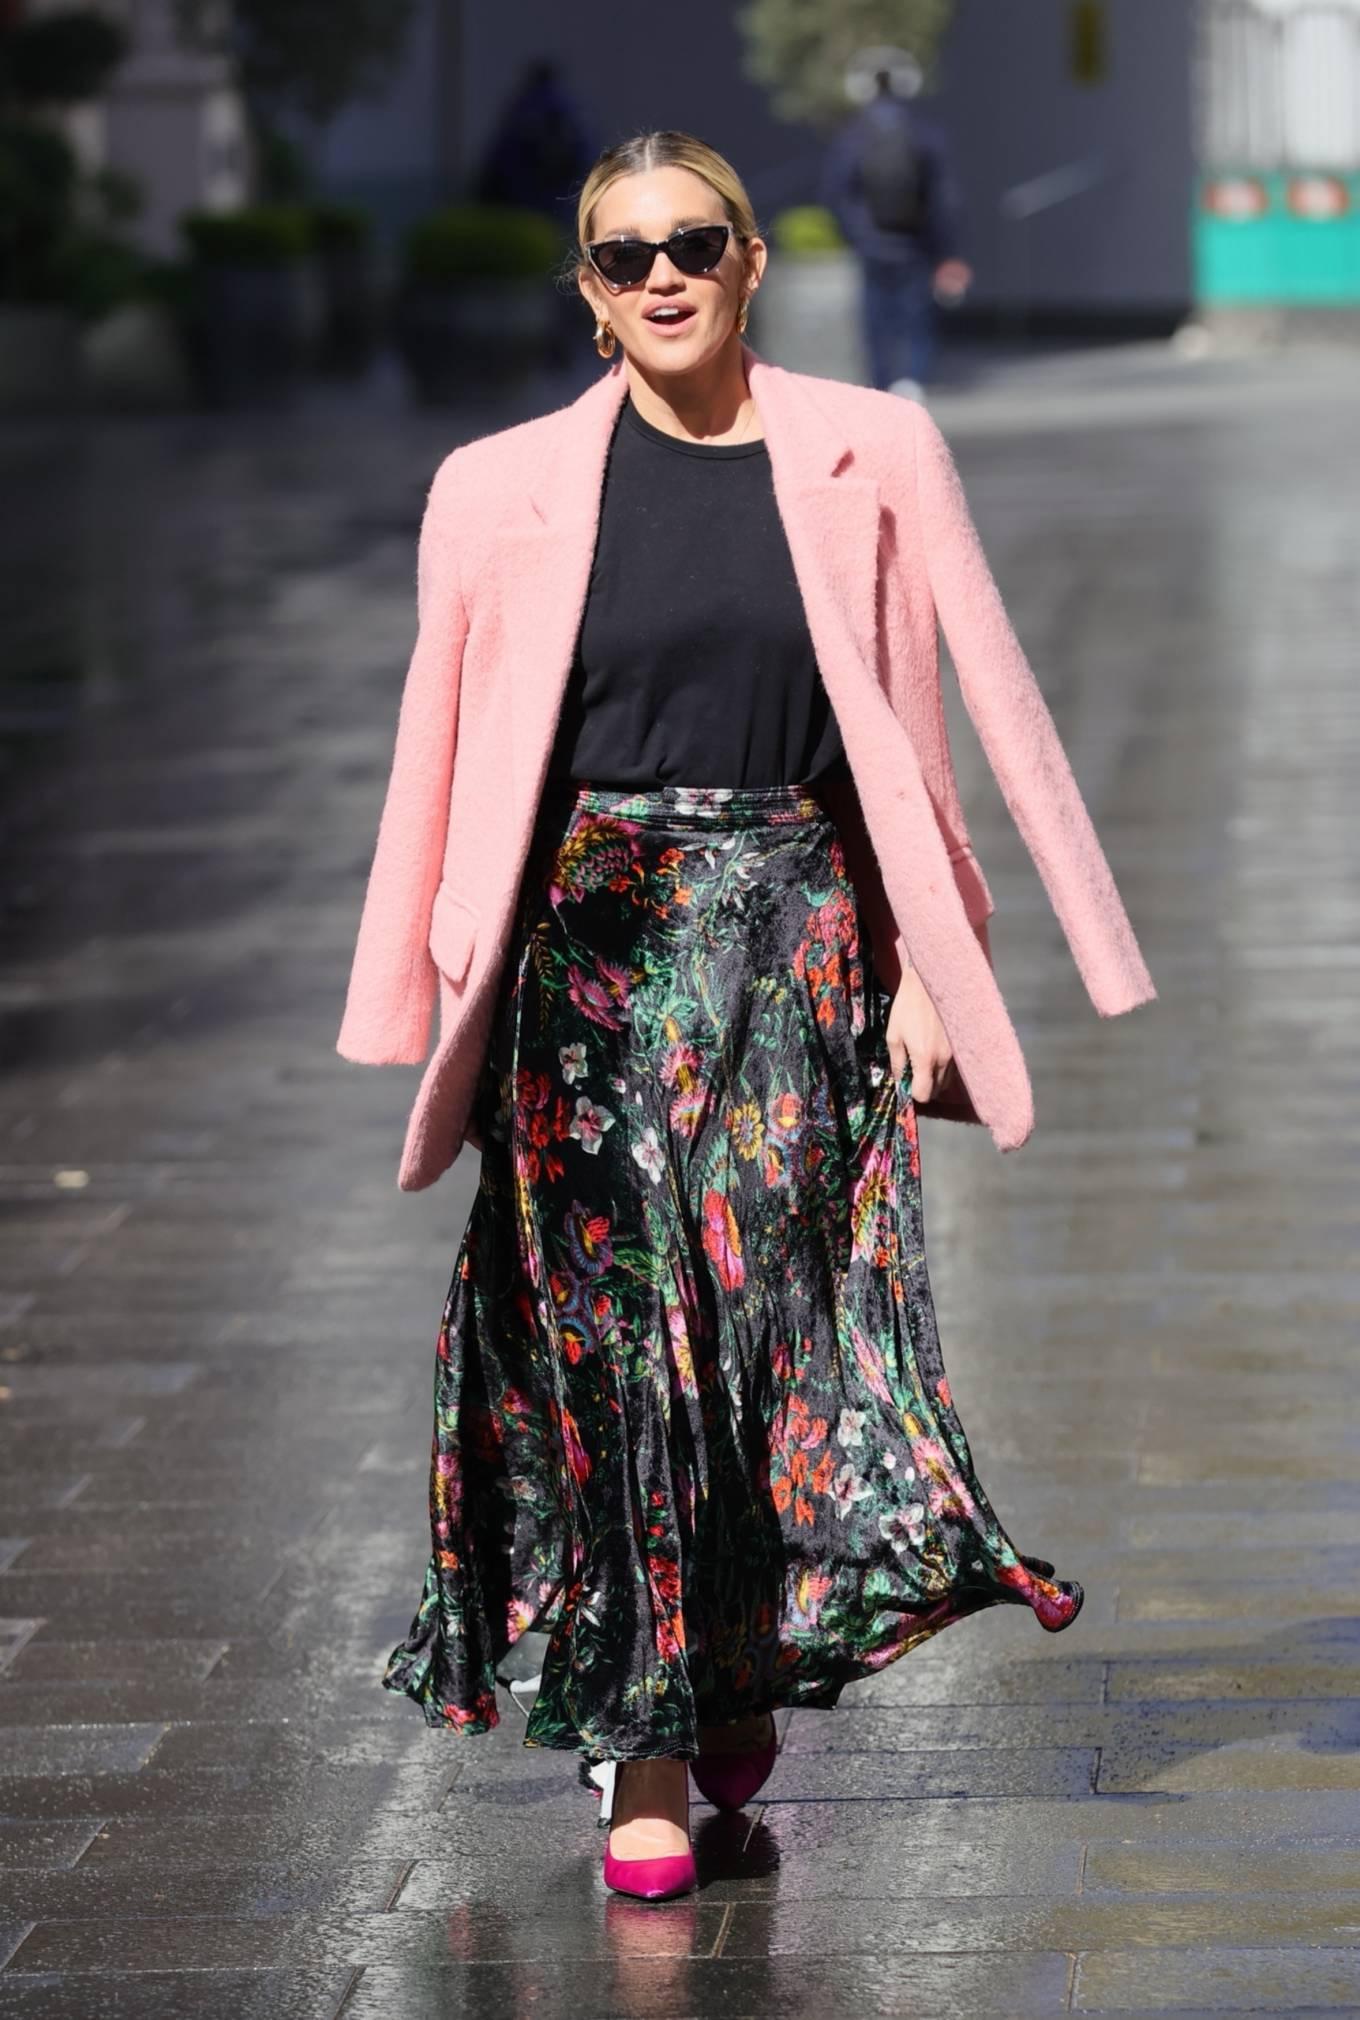 Ashley Roberts 2021 : Ashley Roberts – Seen after the Heart Radio Breakfast Show in London-18